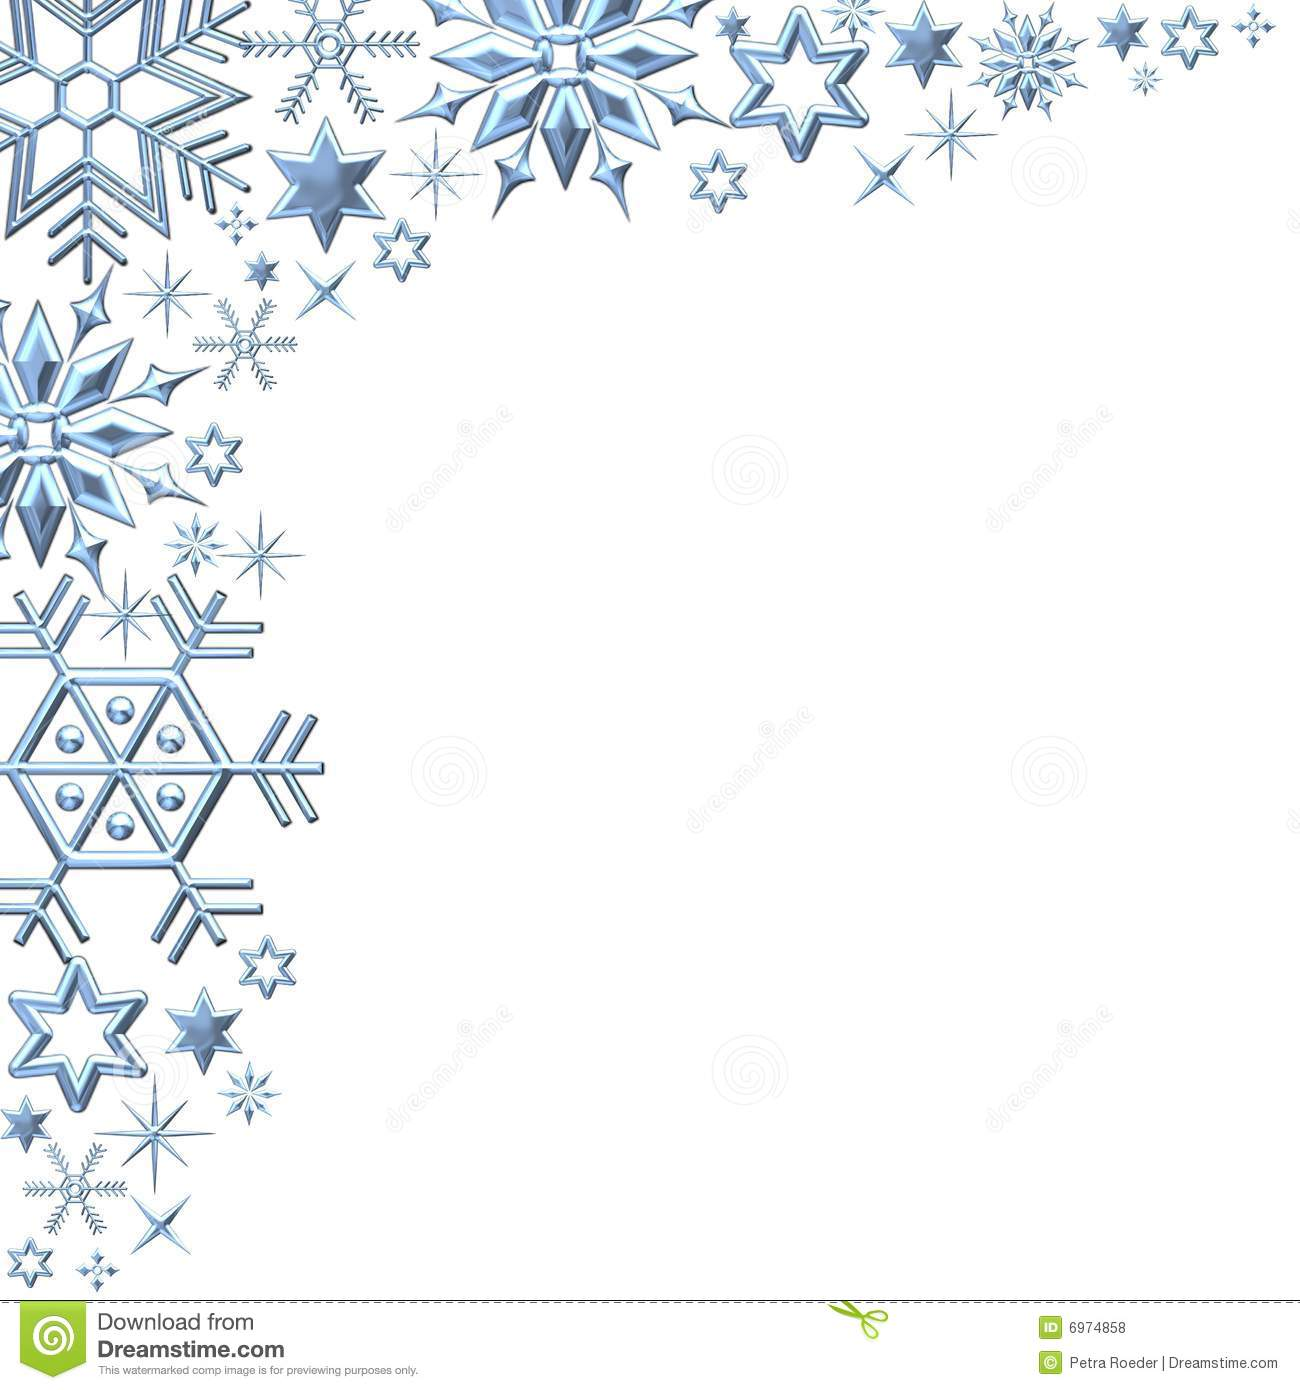 89+ Snowflake Border Clipart.